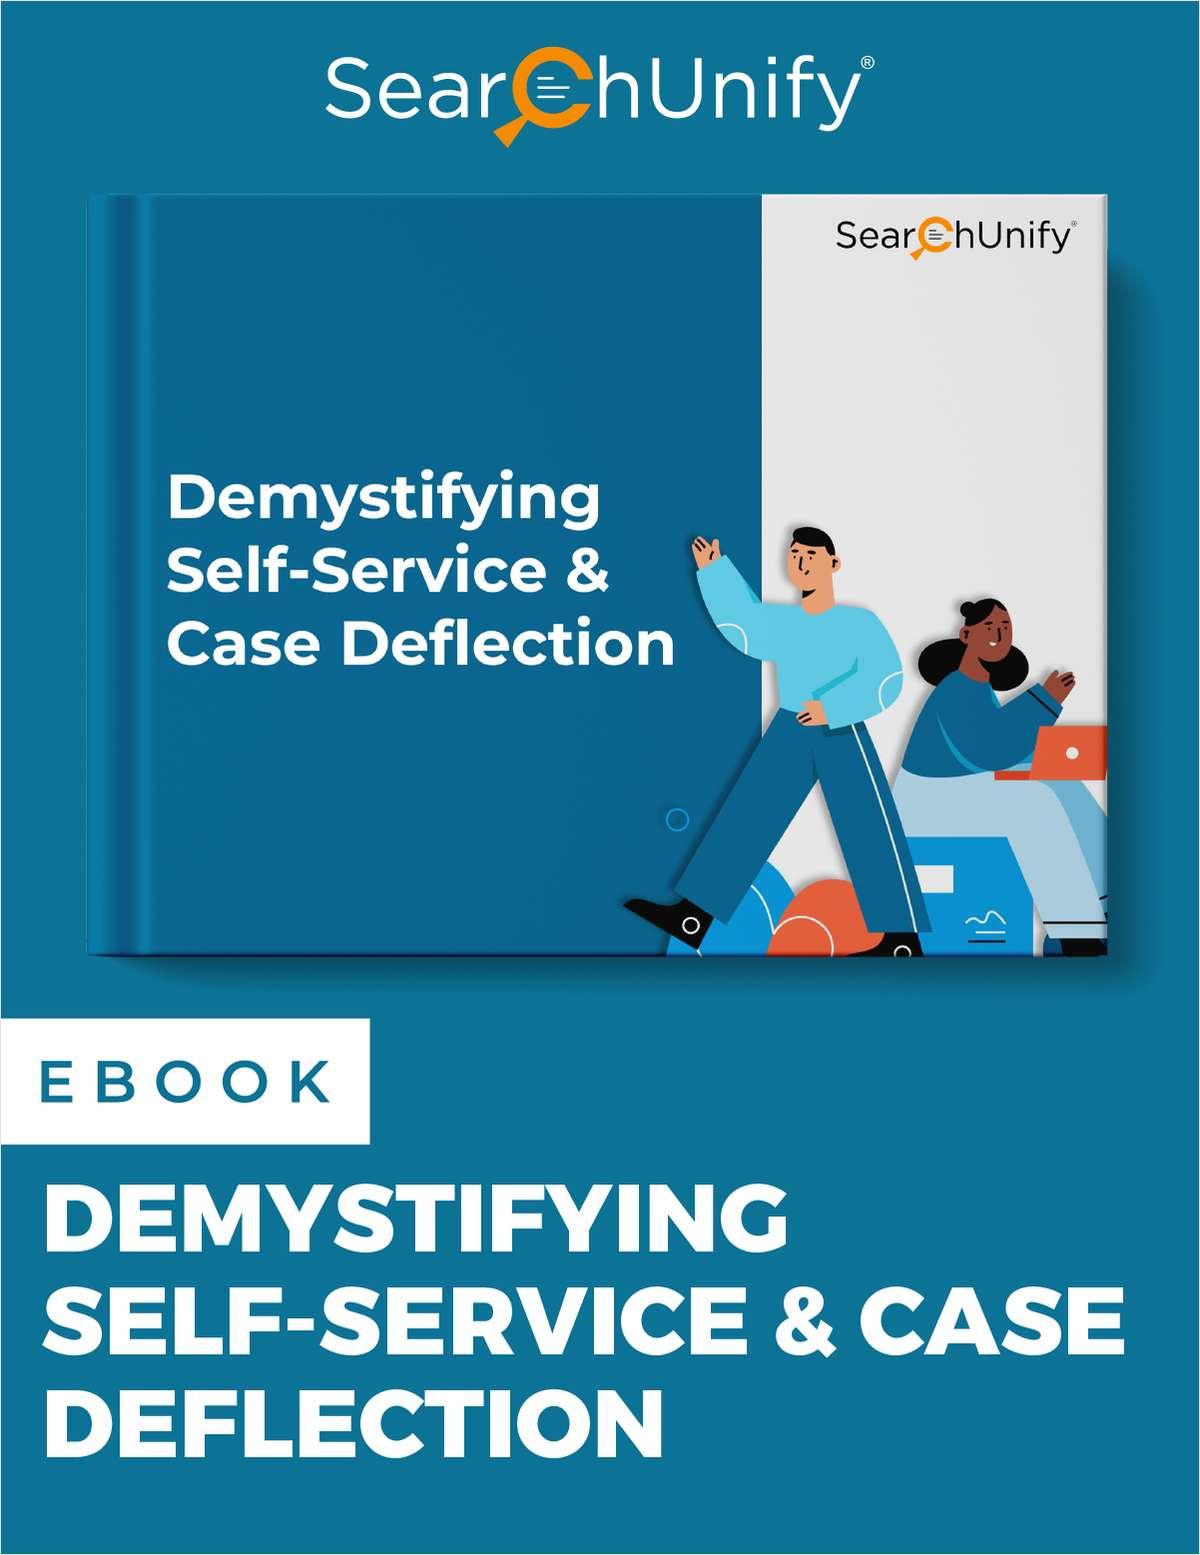 Demystifying Self-Service & Case Deflection